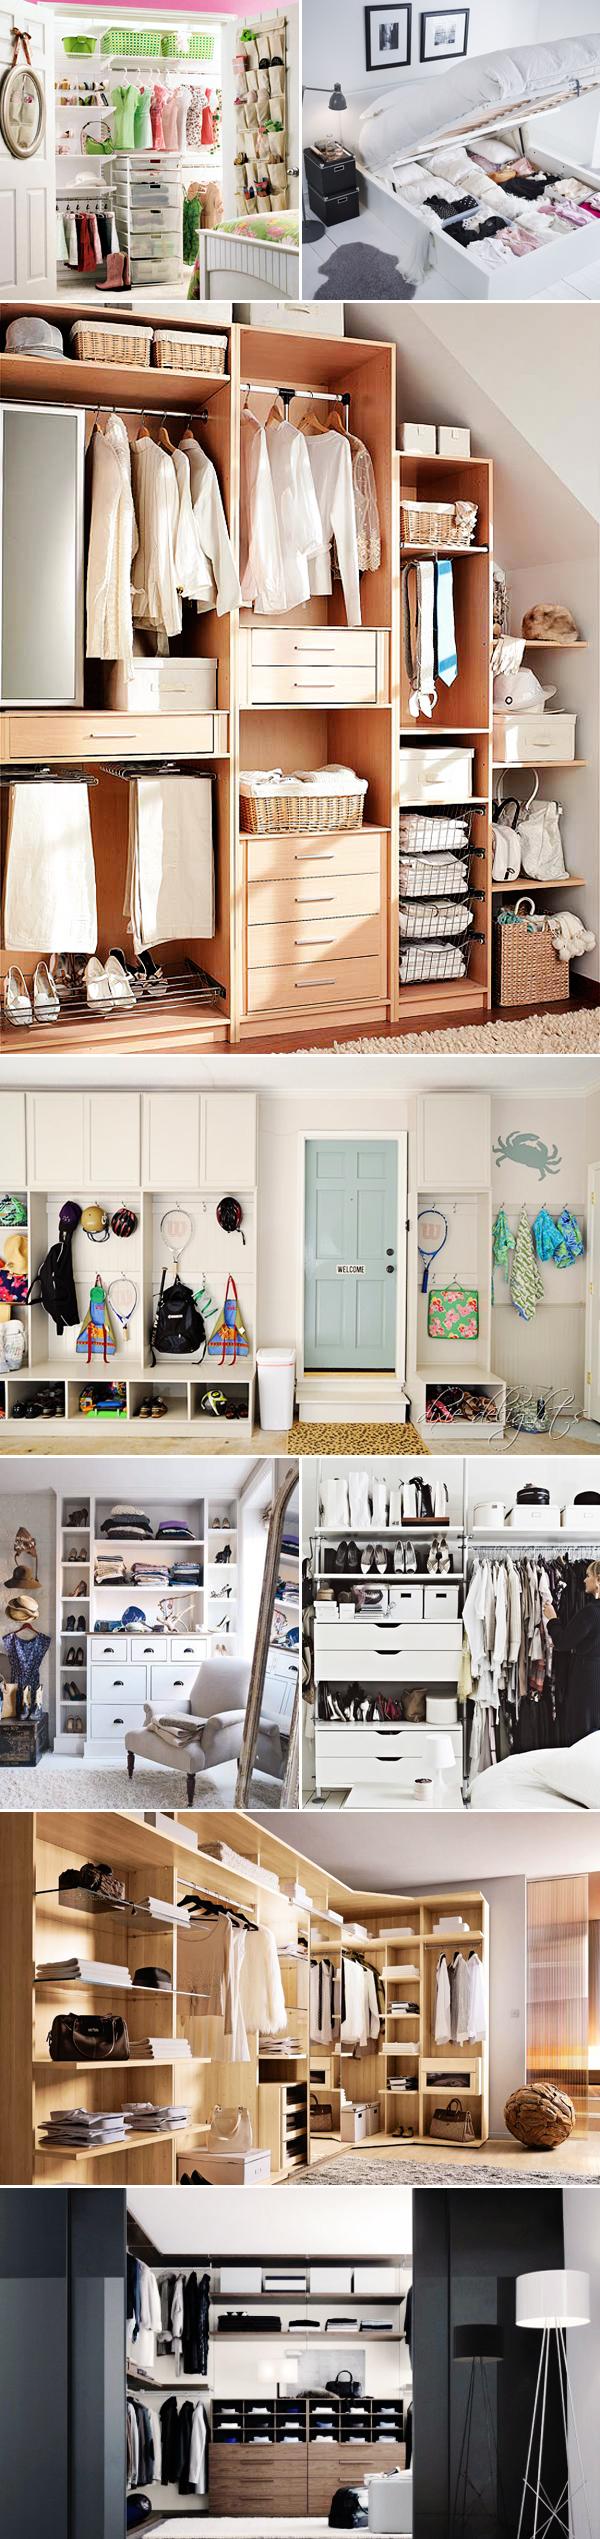 homestorage05-closet